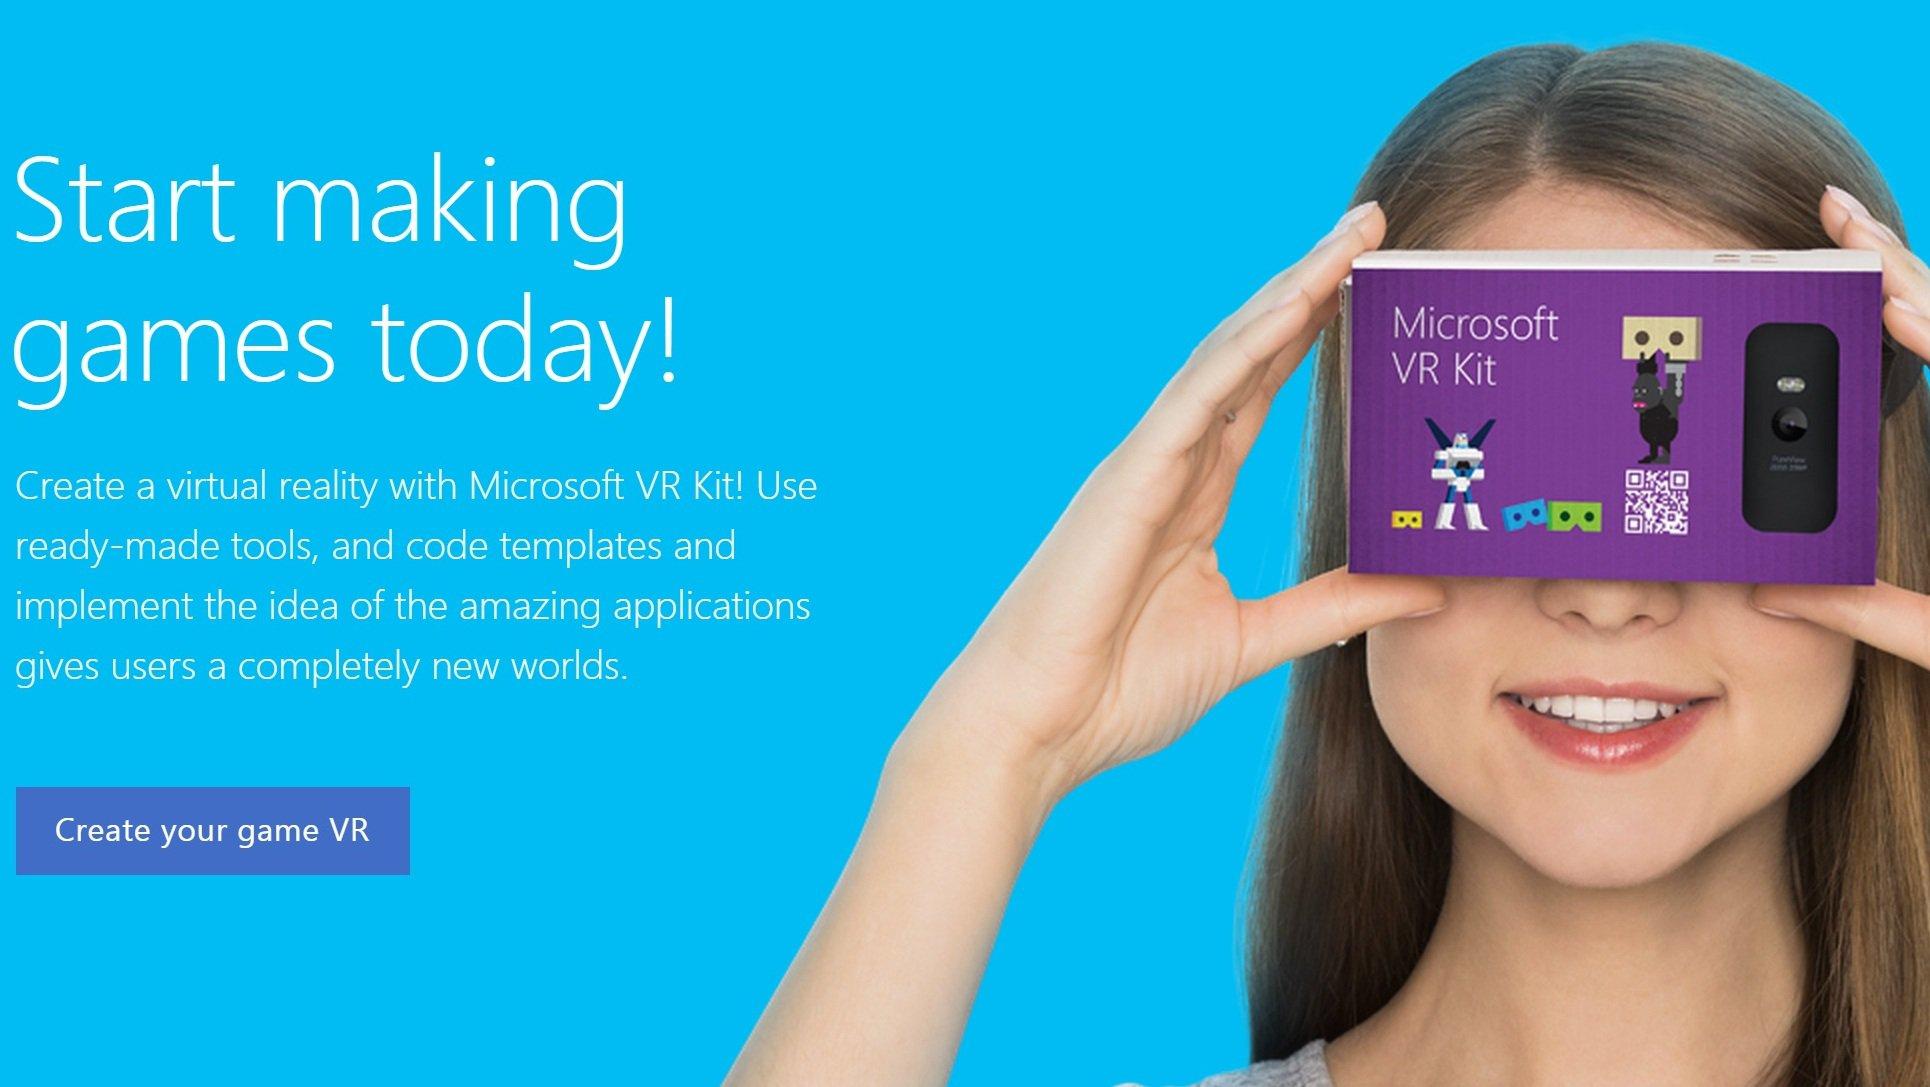 microsoft-vr-kit-translated-version-photoshop-virtual-reality-windows-10-lumia-cardboard